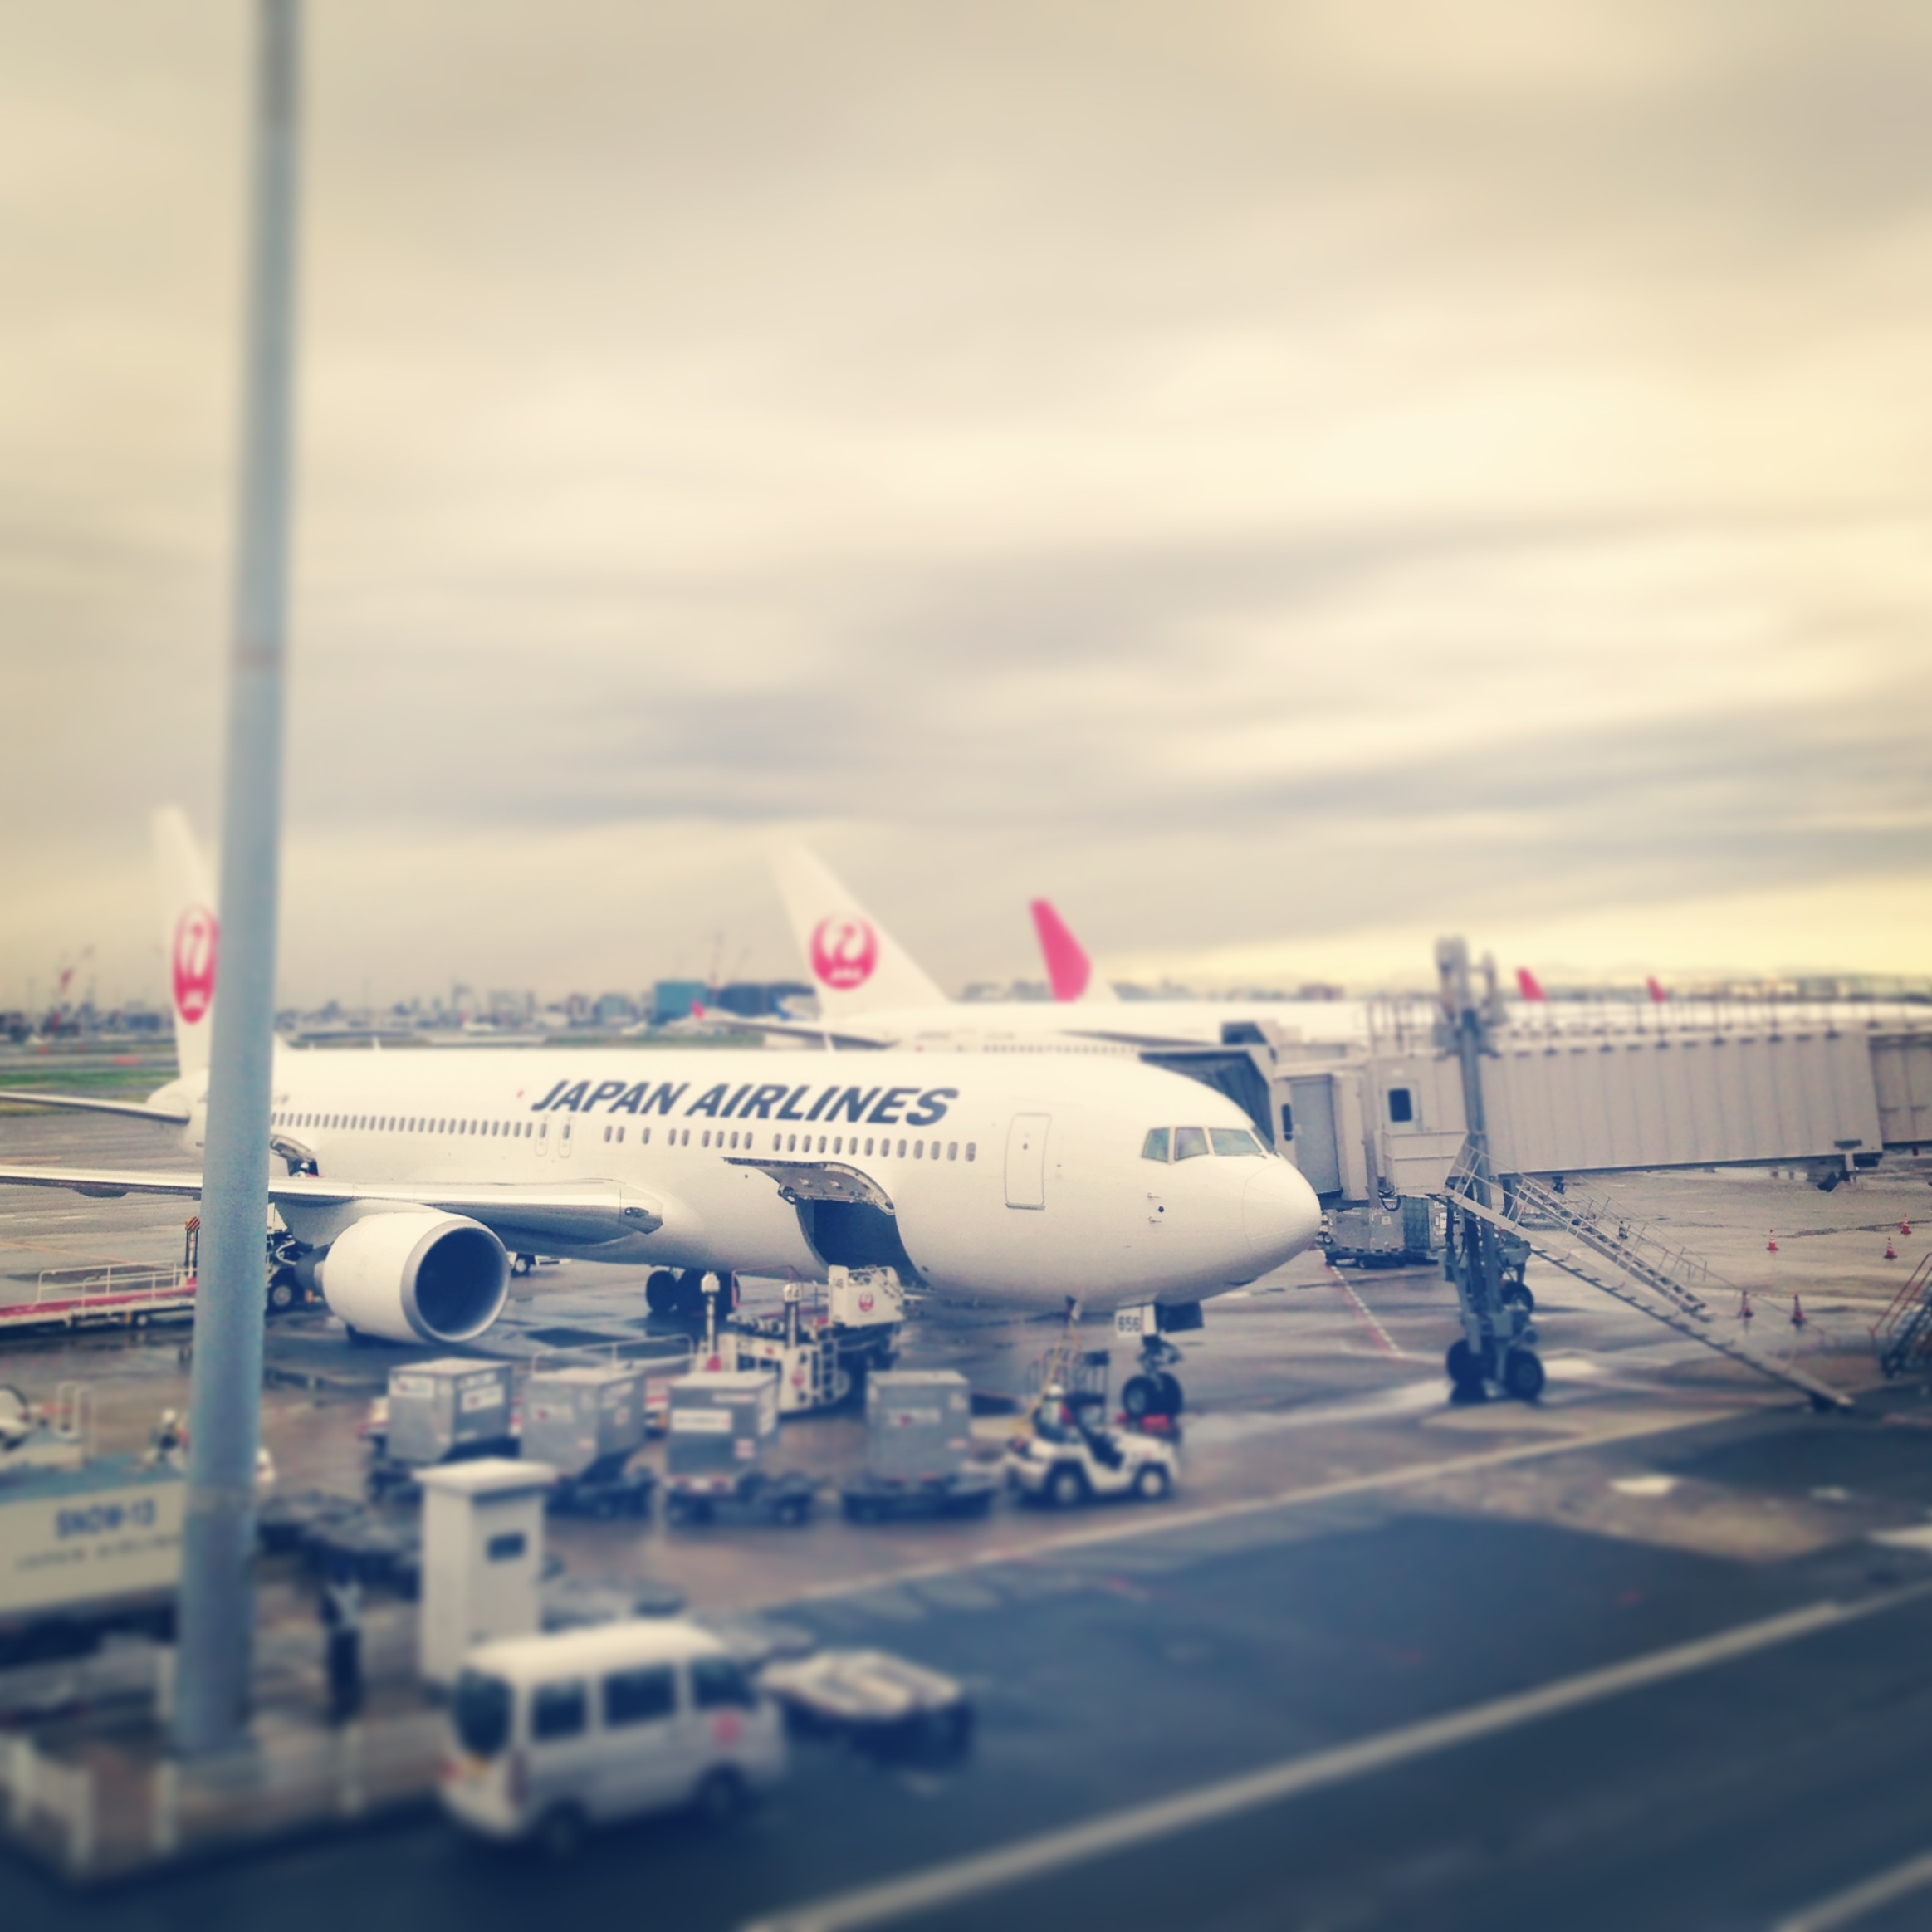 IMG_7477.JPG